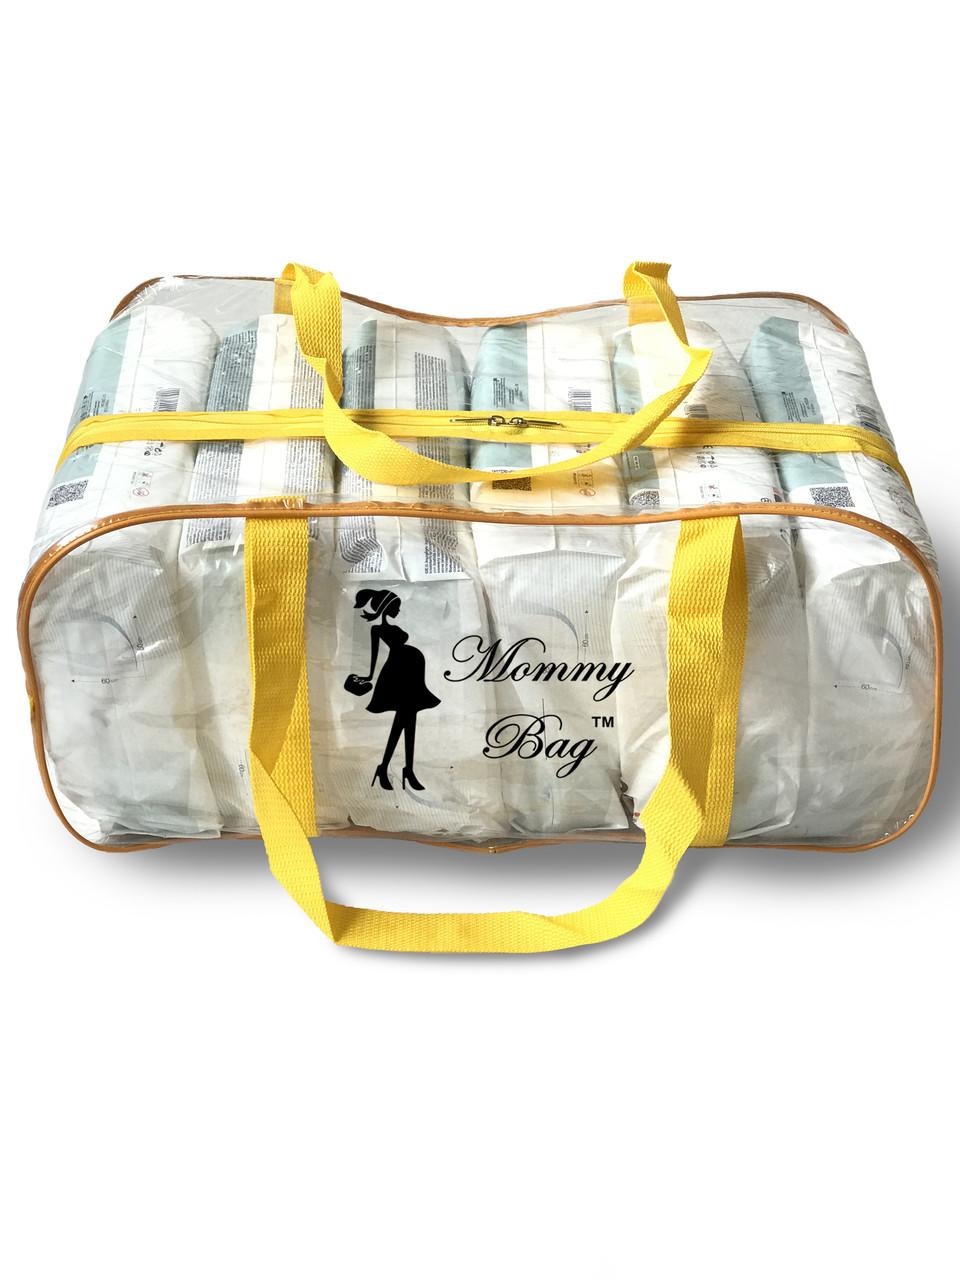 9374ec3aeb31 Сумка прозрачная в роддом Mommy Bag - L - 50*23*32 см Желтая, цена ...